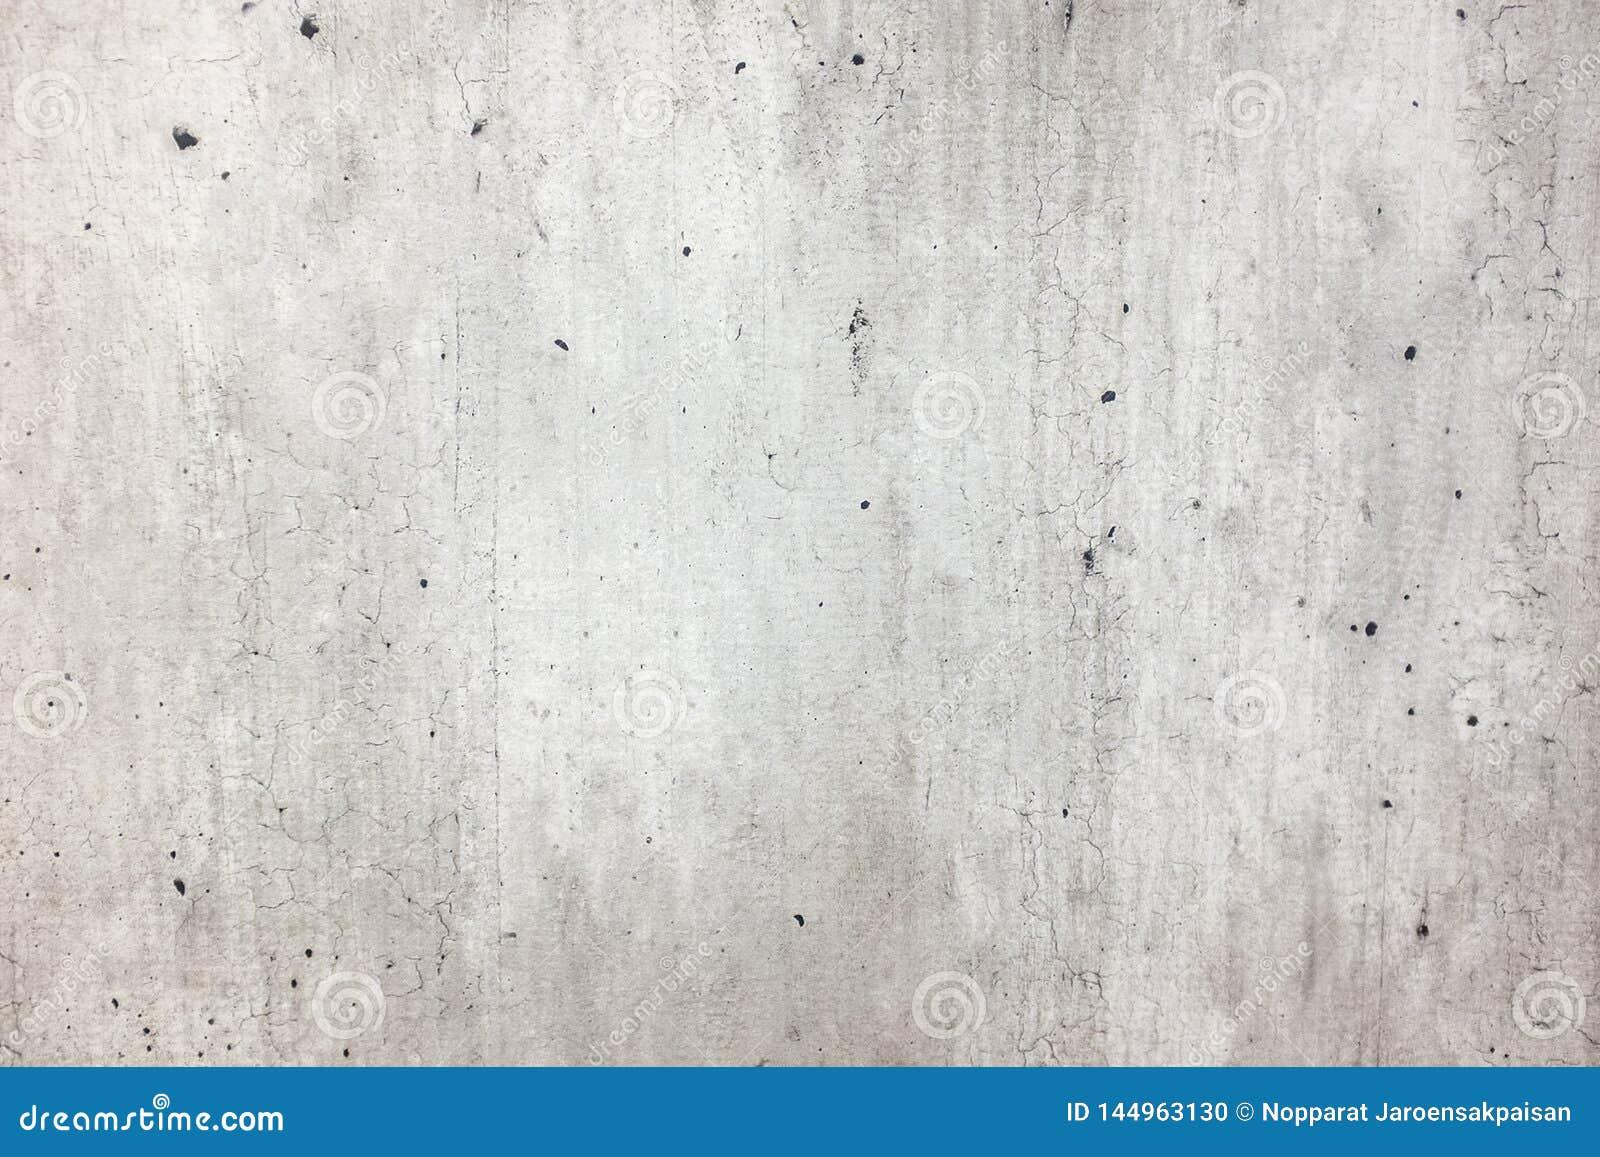 Textura del viejo fondo del muro de cemento